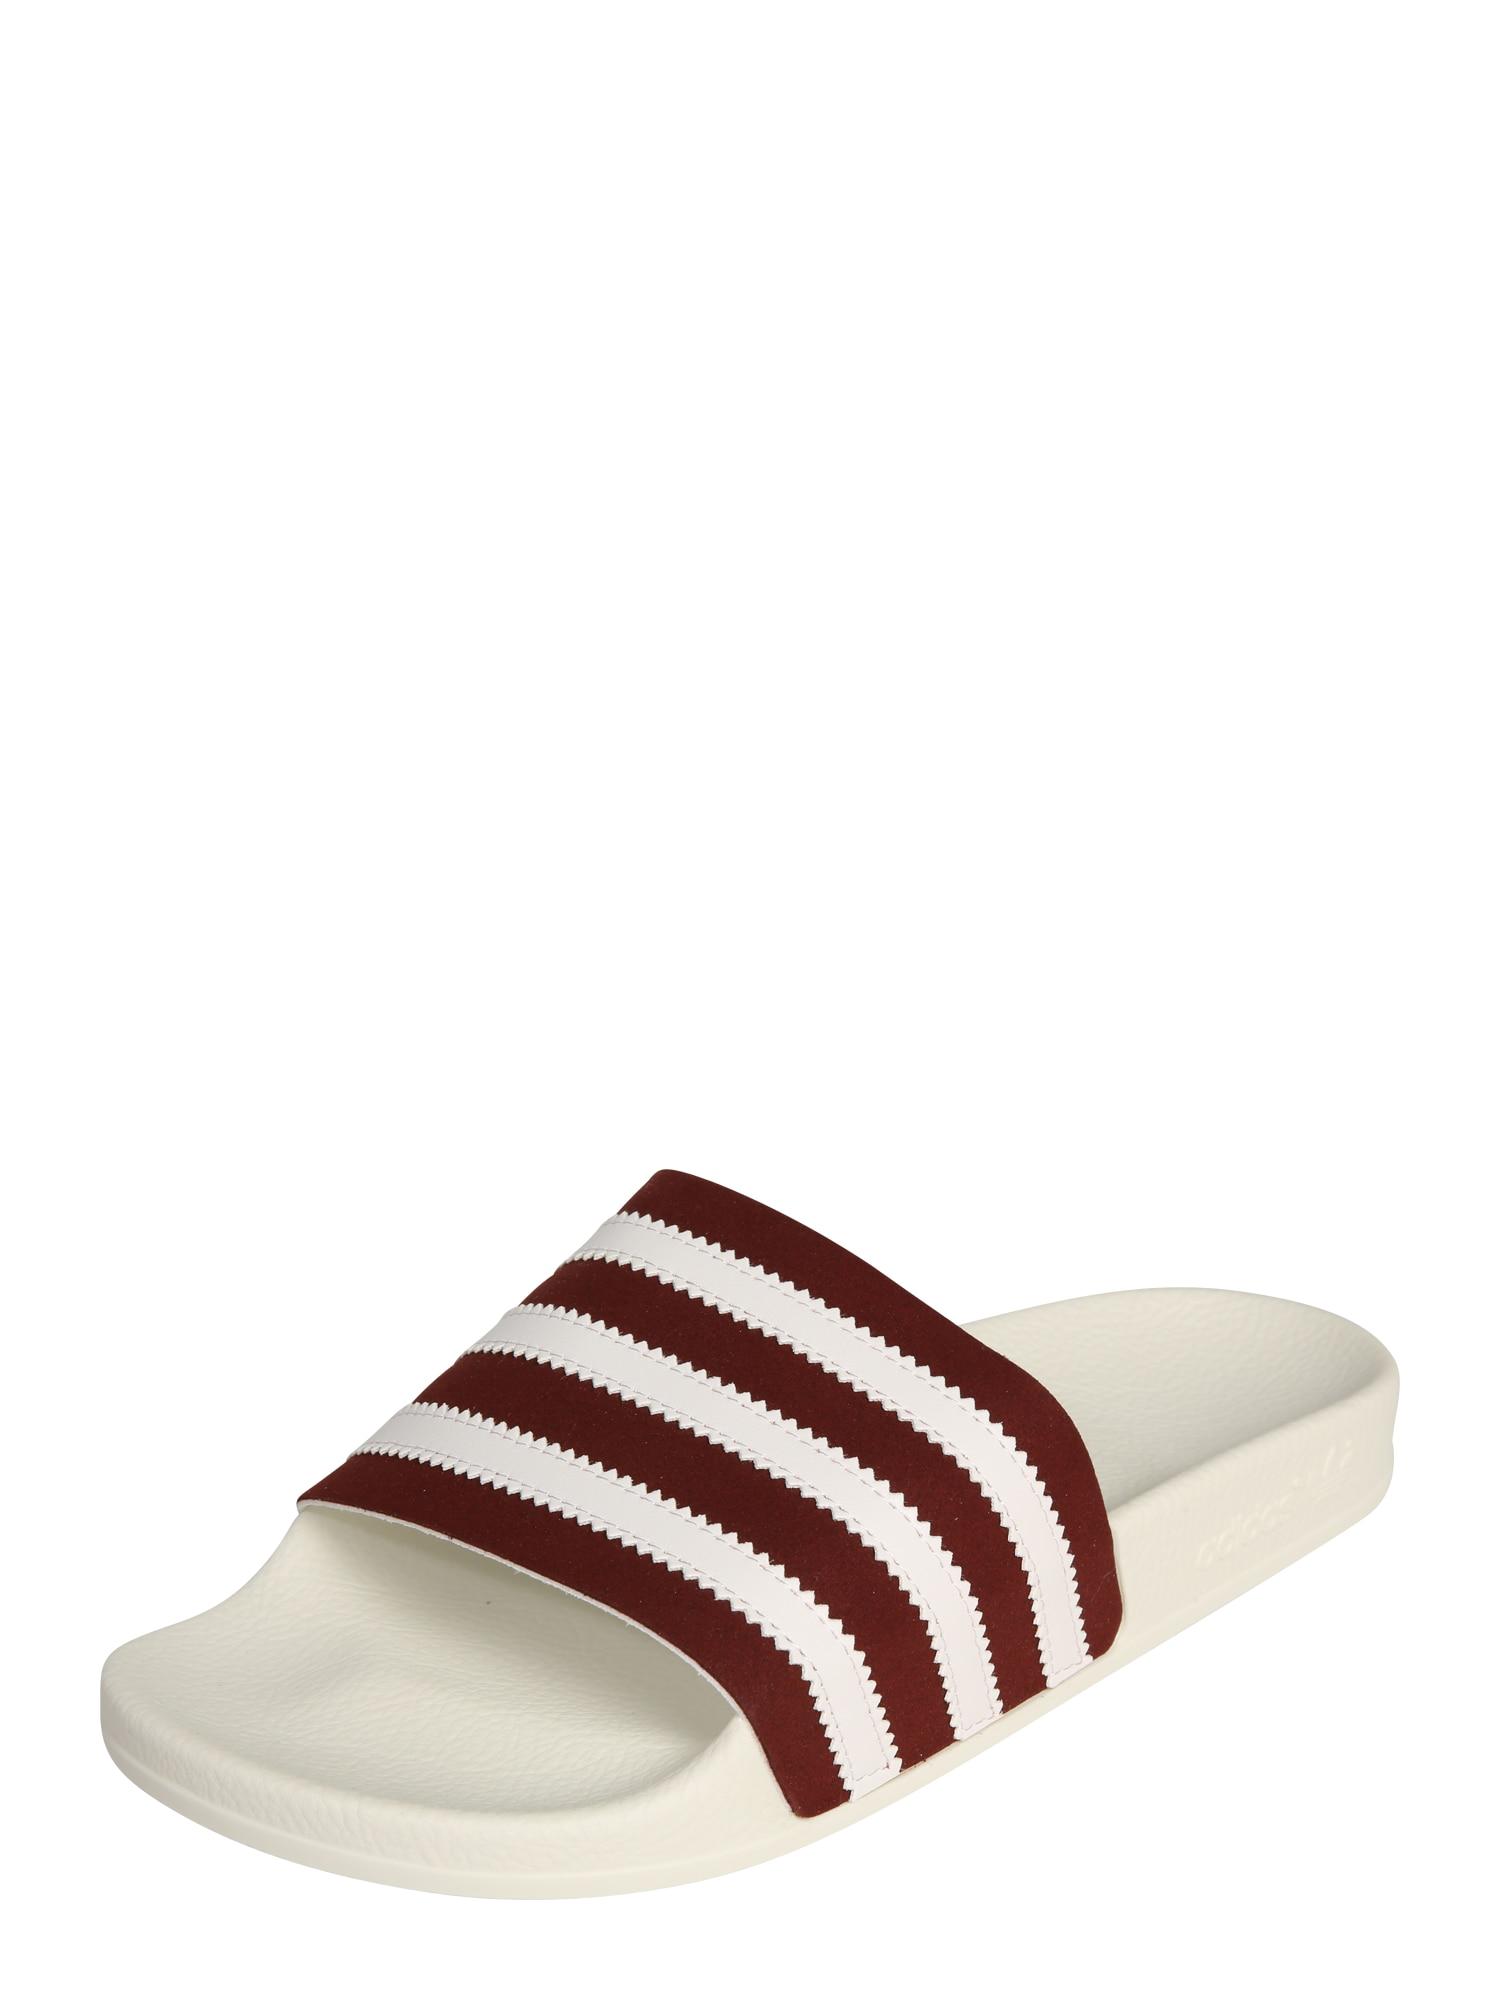 Pantofle Adilette bordó bílá ADIDAS ORIGINALS